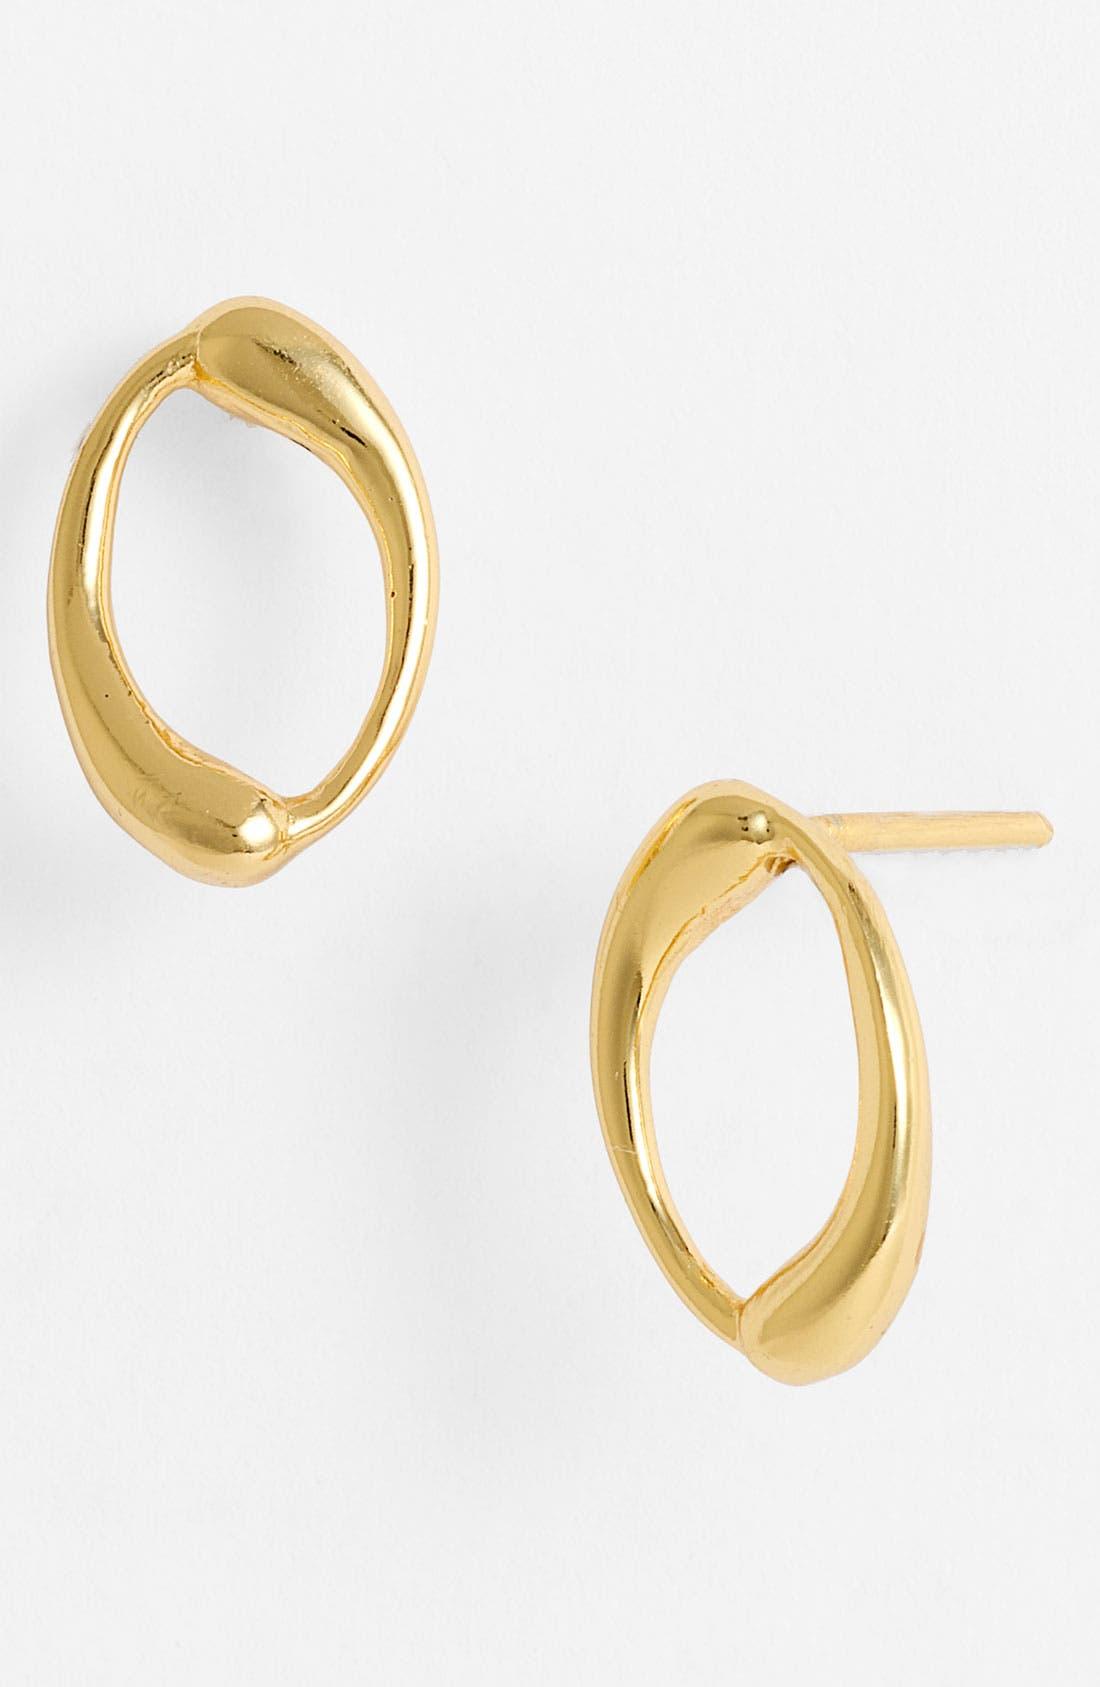 Alternate Image 1 Selected - Argento Vivo Open Stud Earrings (Online Only)